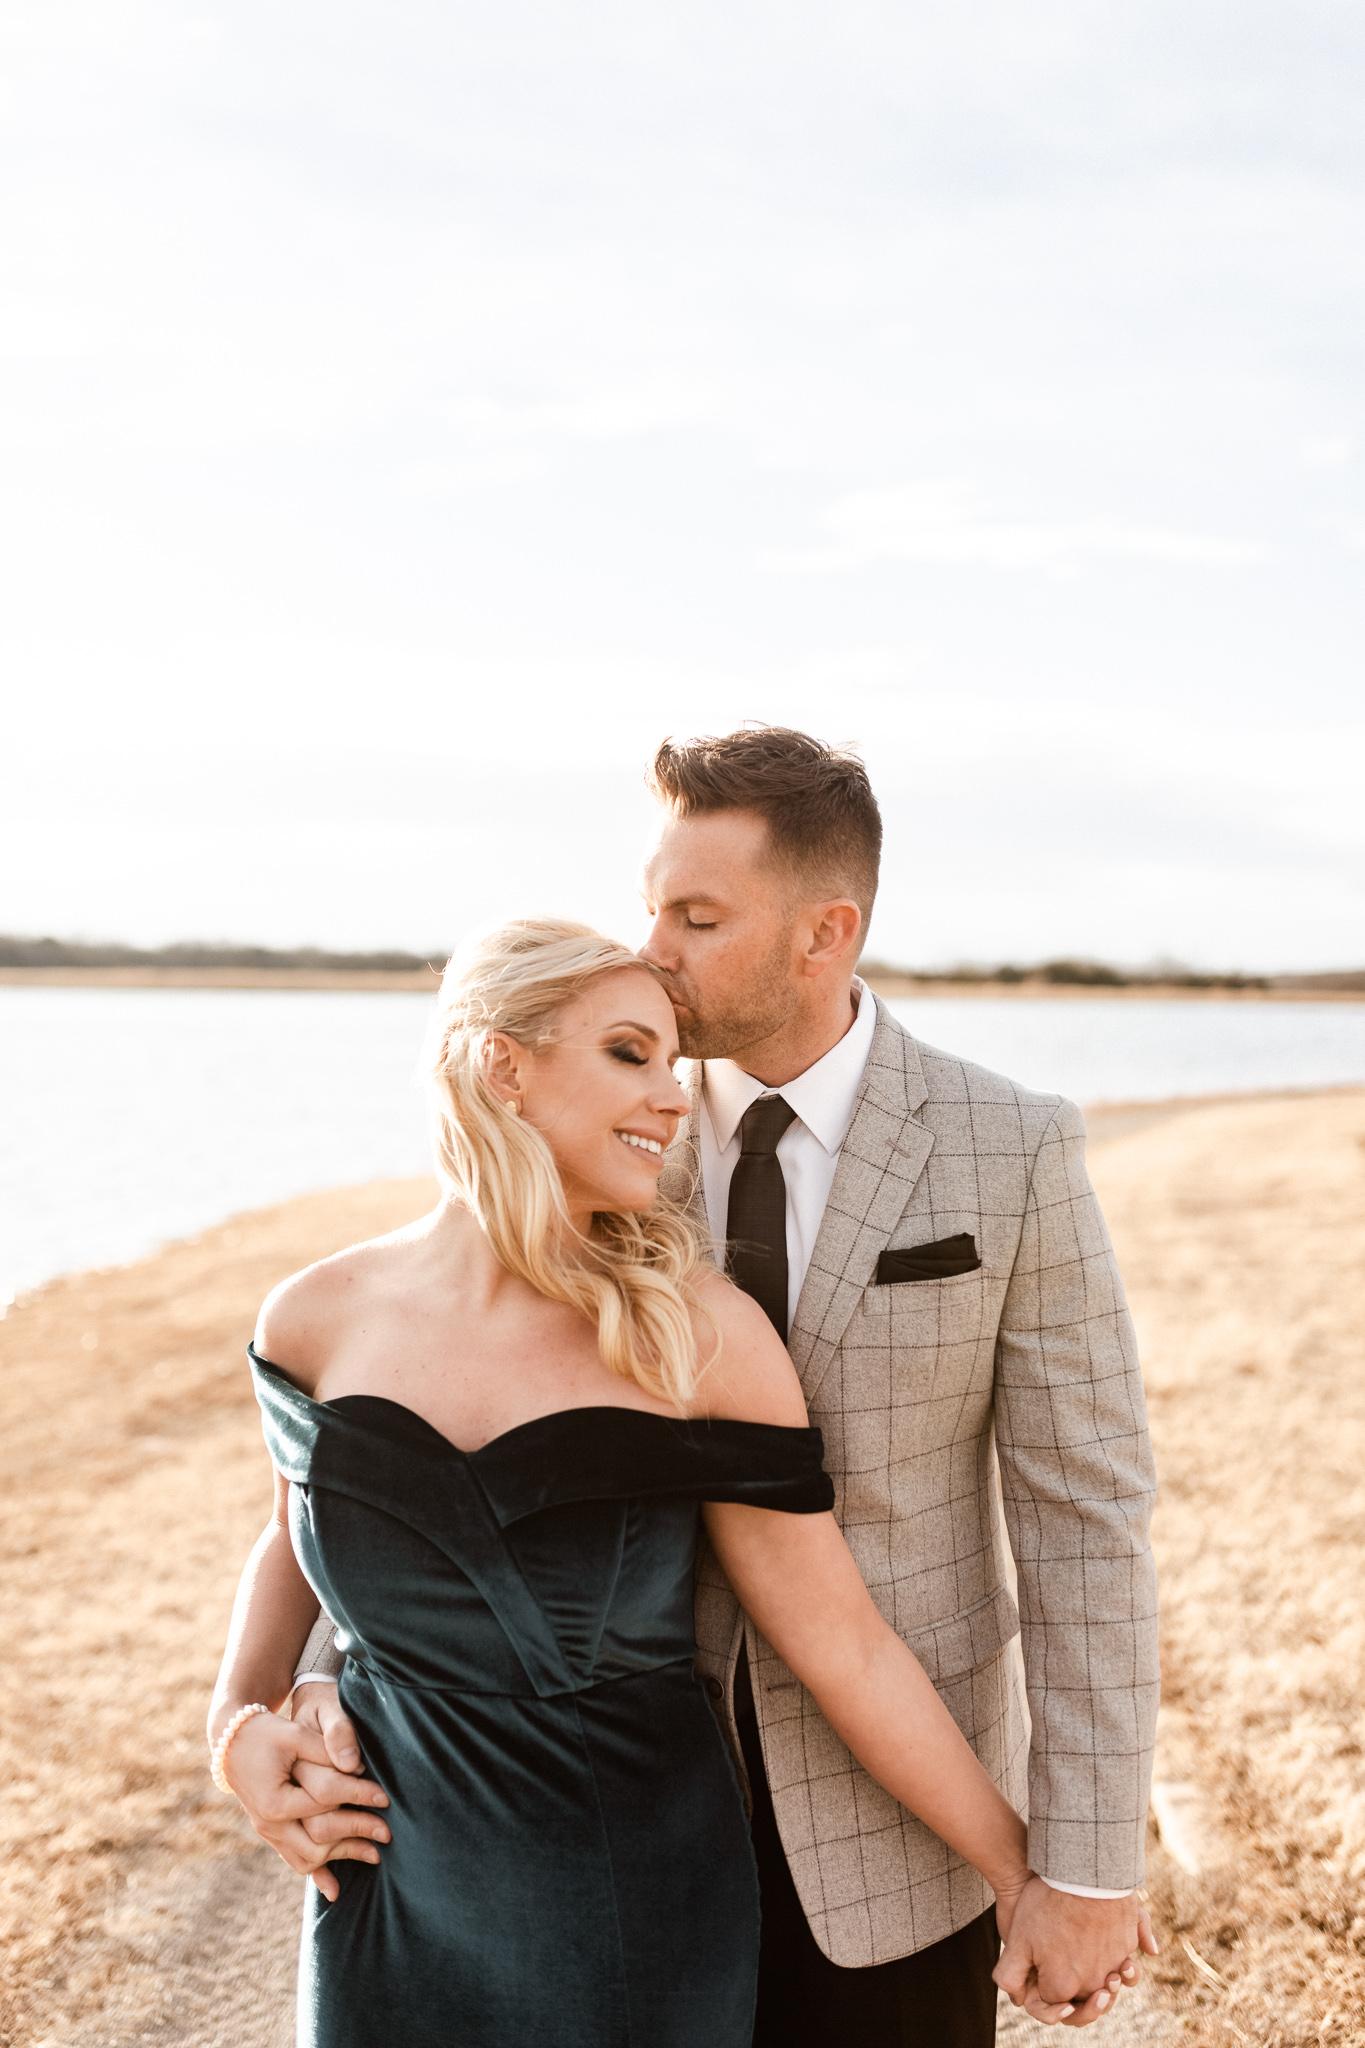 Wade + Stephanie | Warm Open Field Engagements | Oklahoma Wedding Photographer-37.jpg